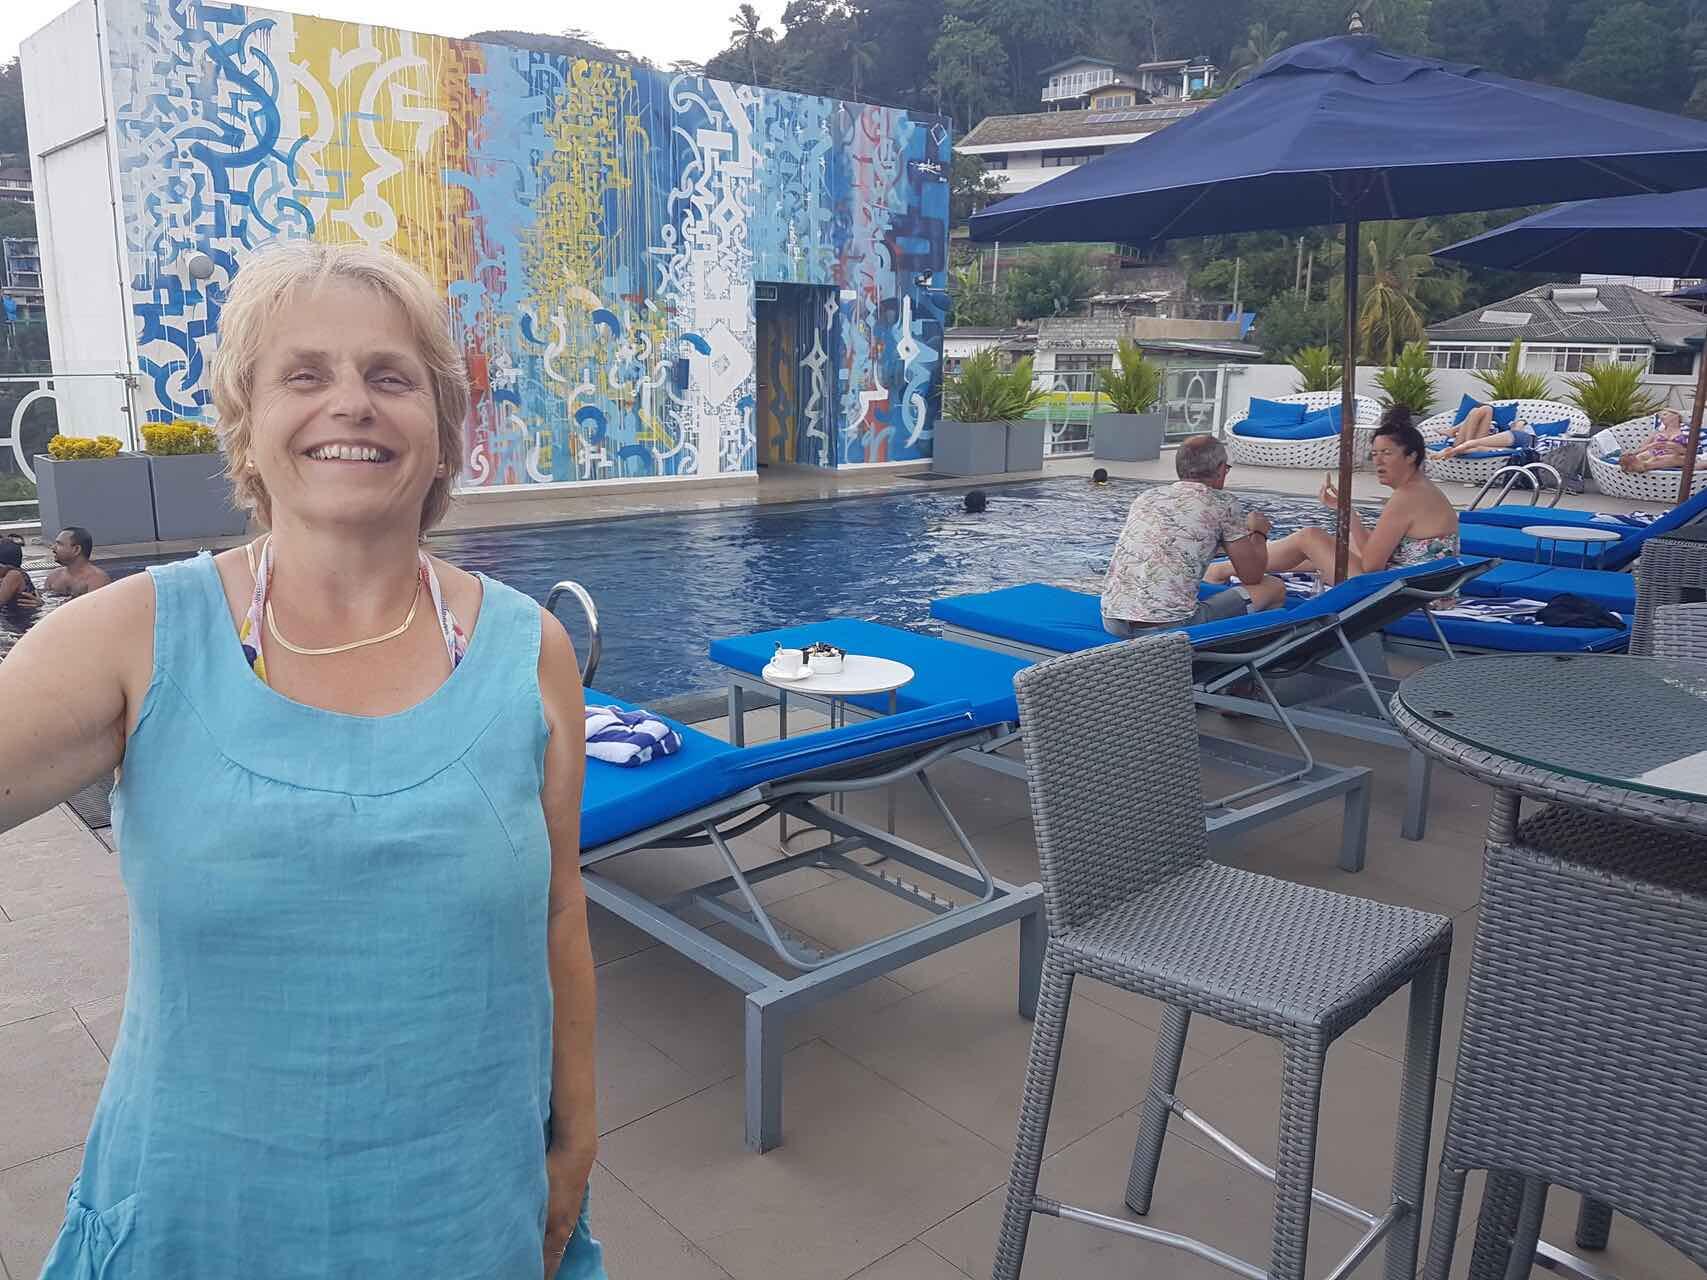 sri-lanka-kandy-hotel-ozo-holiday-review-feedback-invite-to-paradise-quentin-kate-hulm.jpg